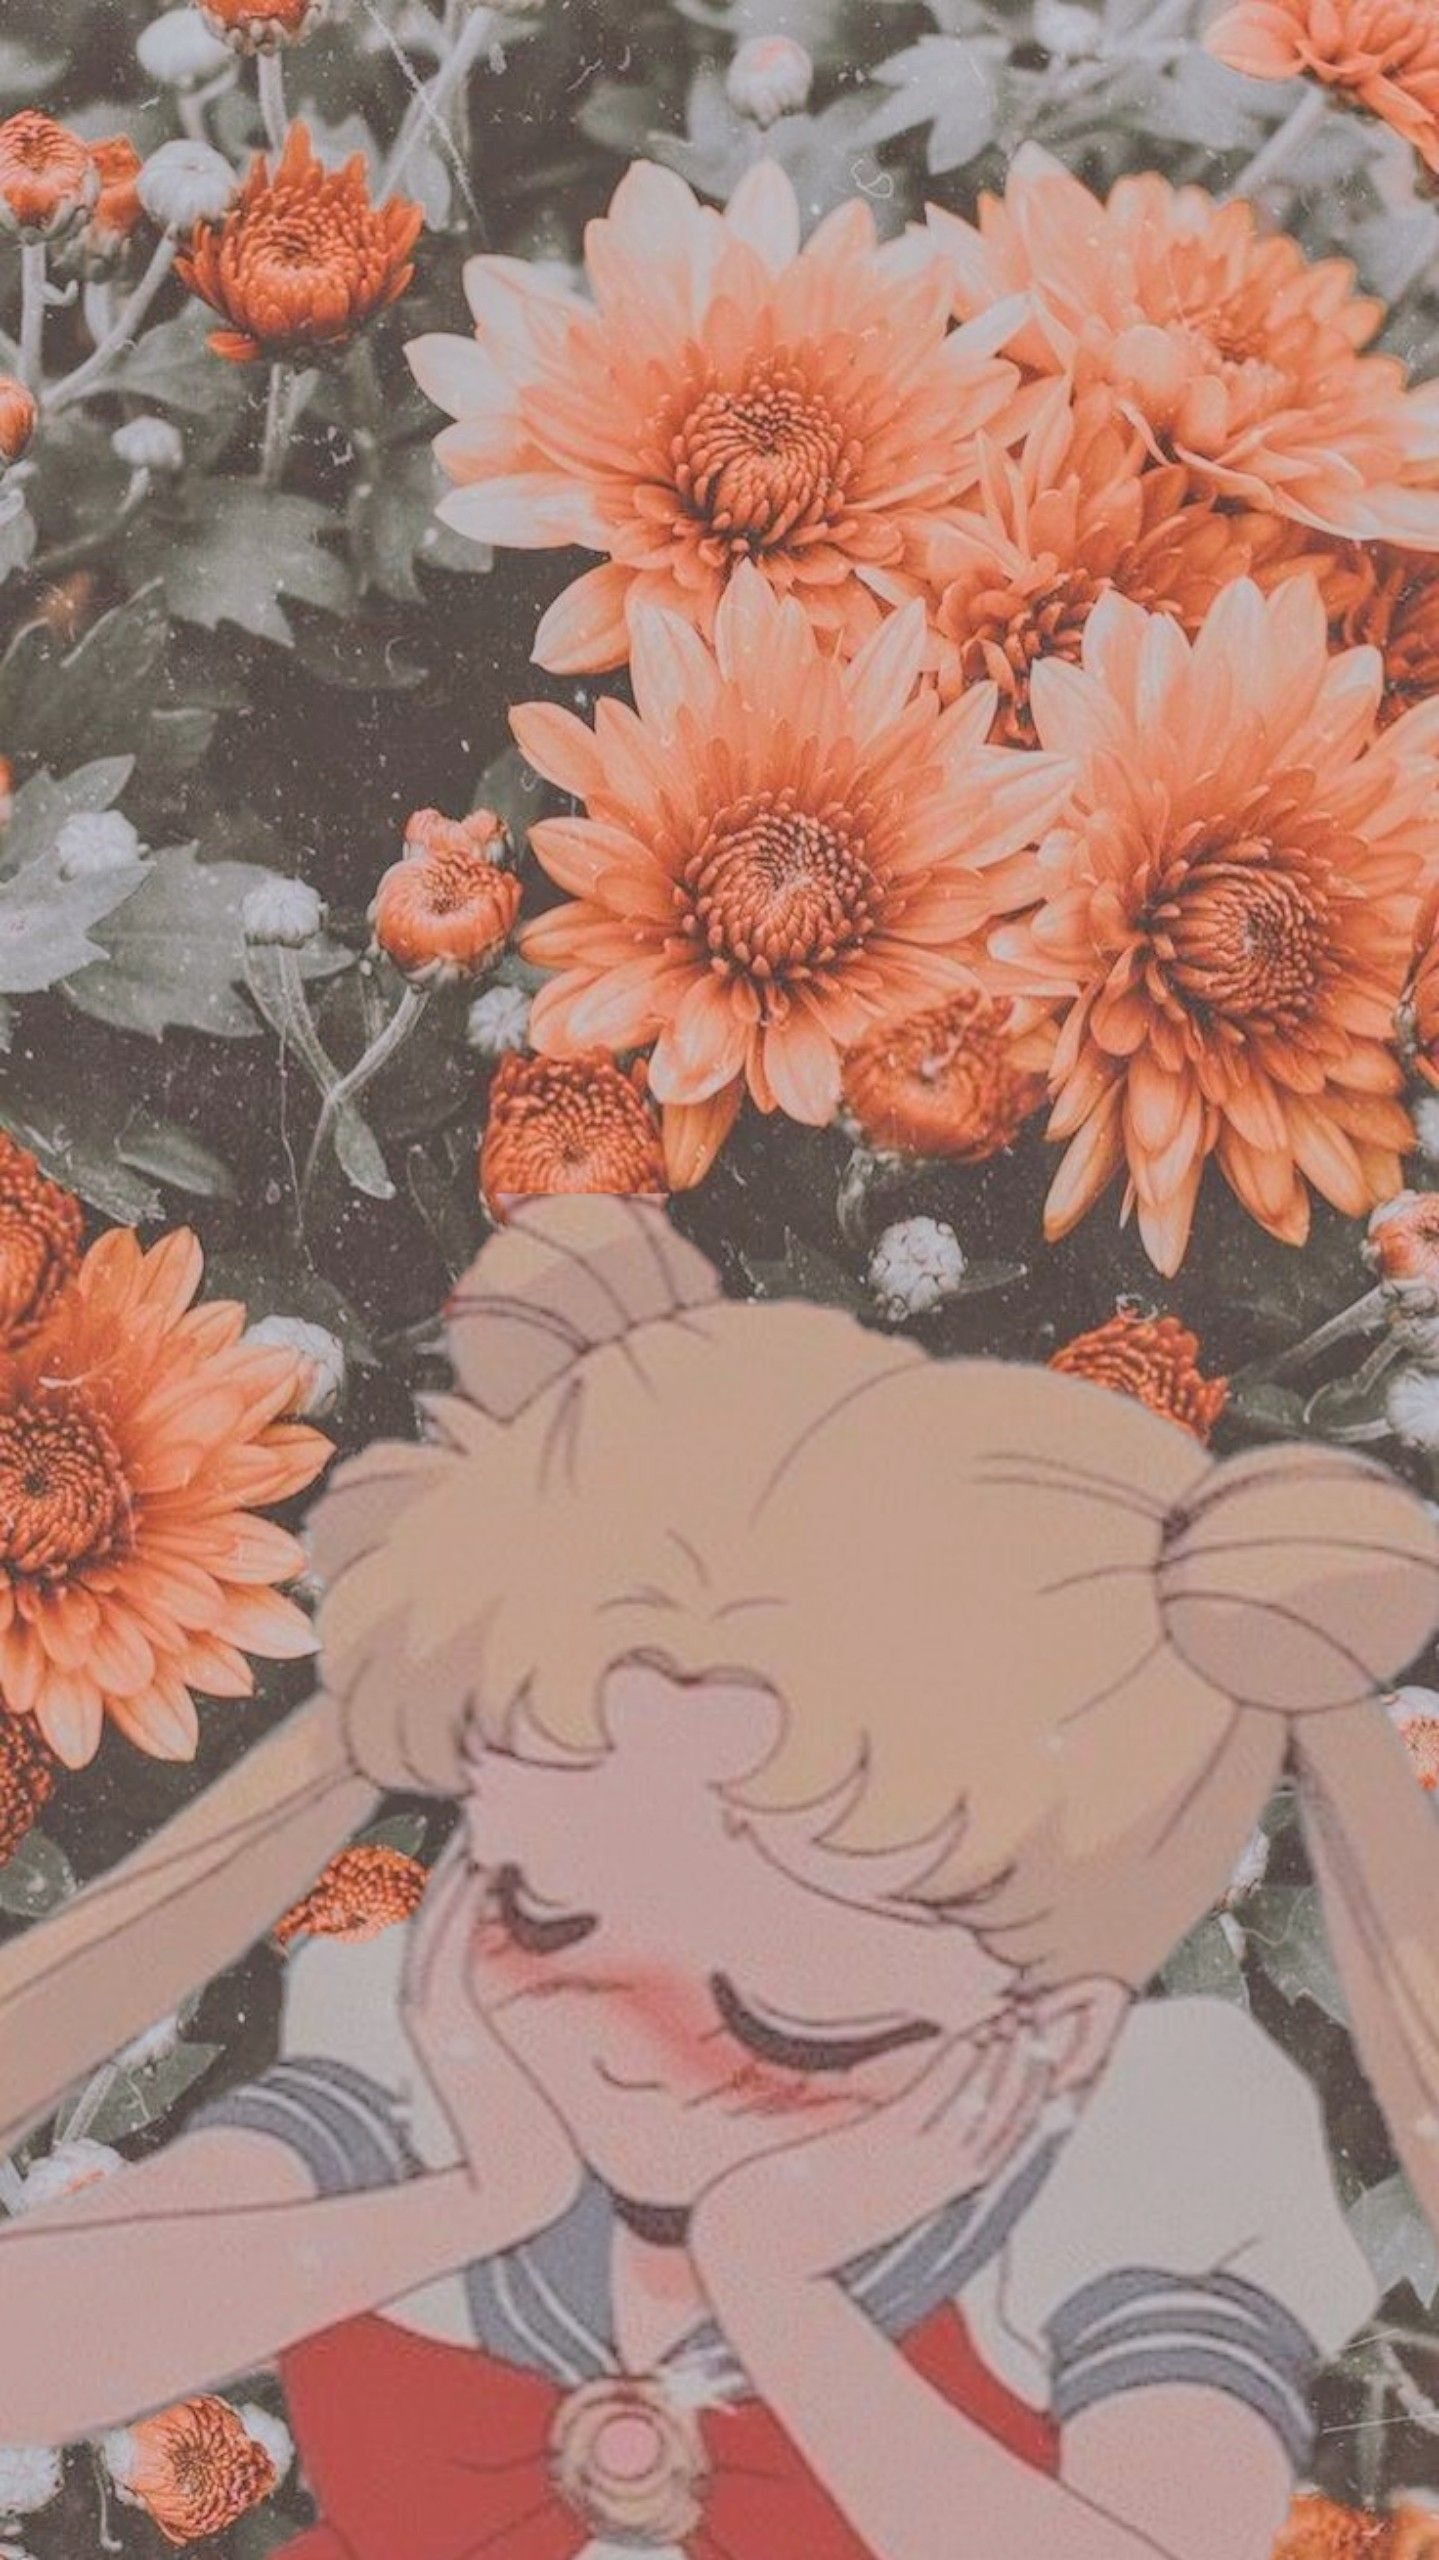 Sailor Moon Anime Love Orange Pink Flowers Edit Wallpaper Sailor Moon Aesthetic Anime Anime Wallpaper Anime sailor moon phone wallpaper